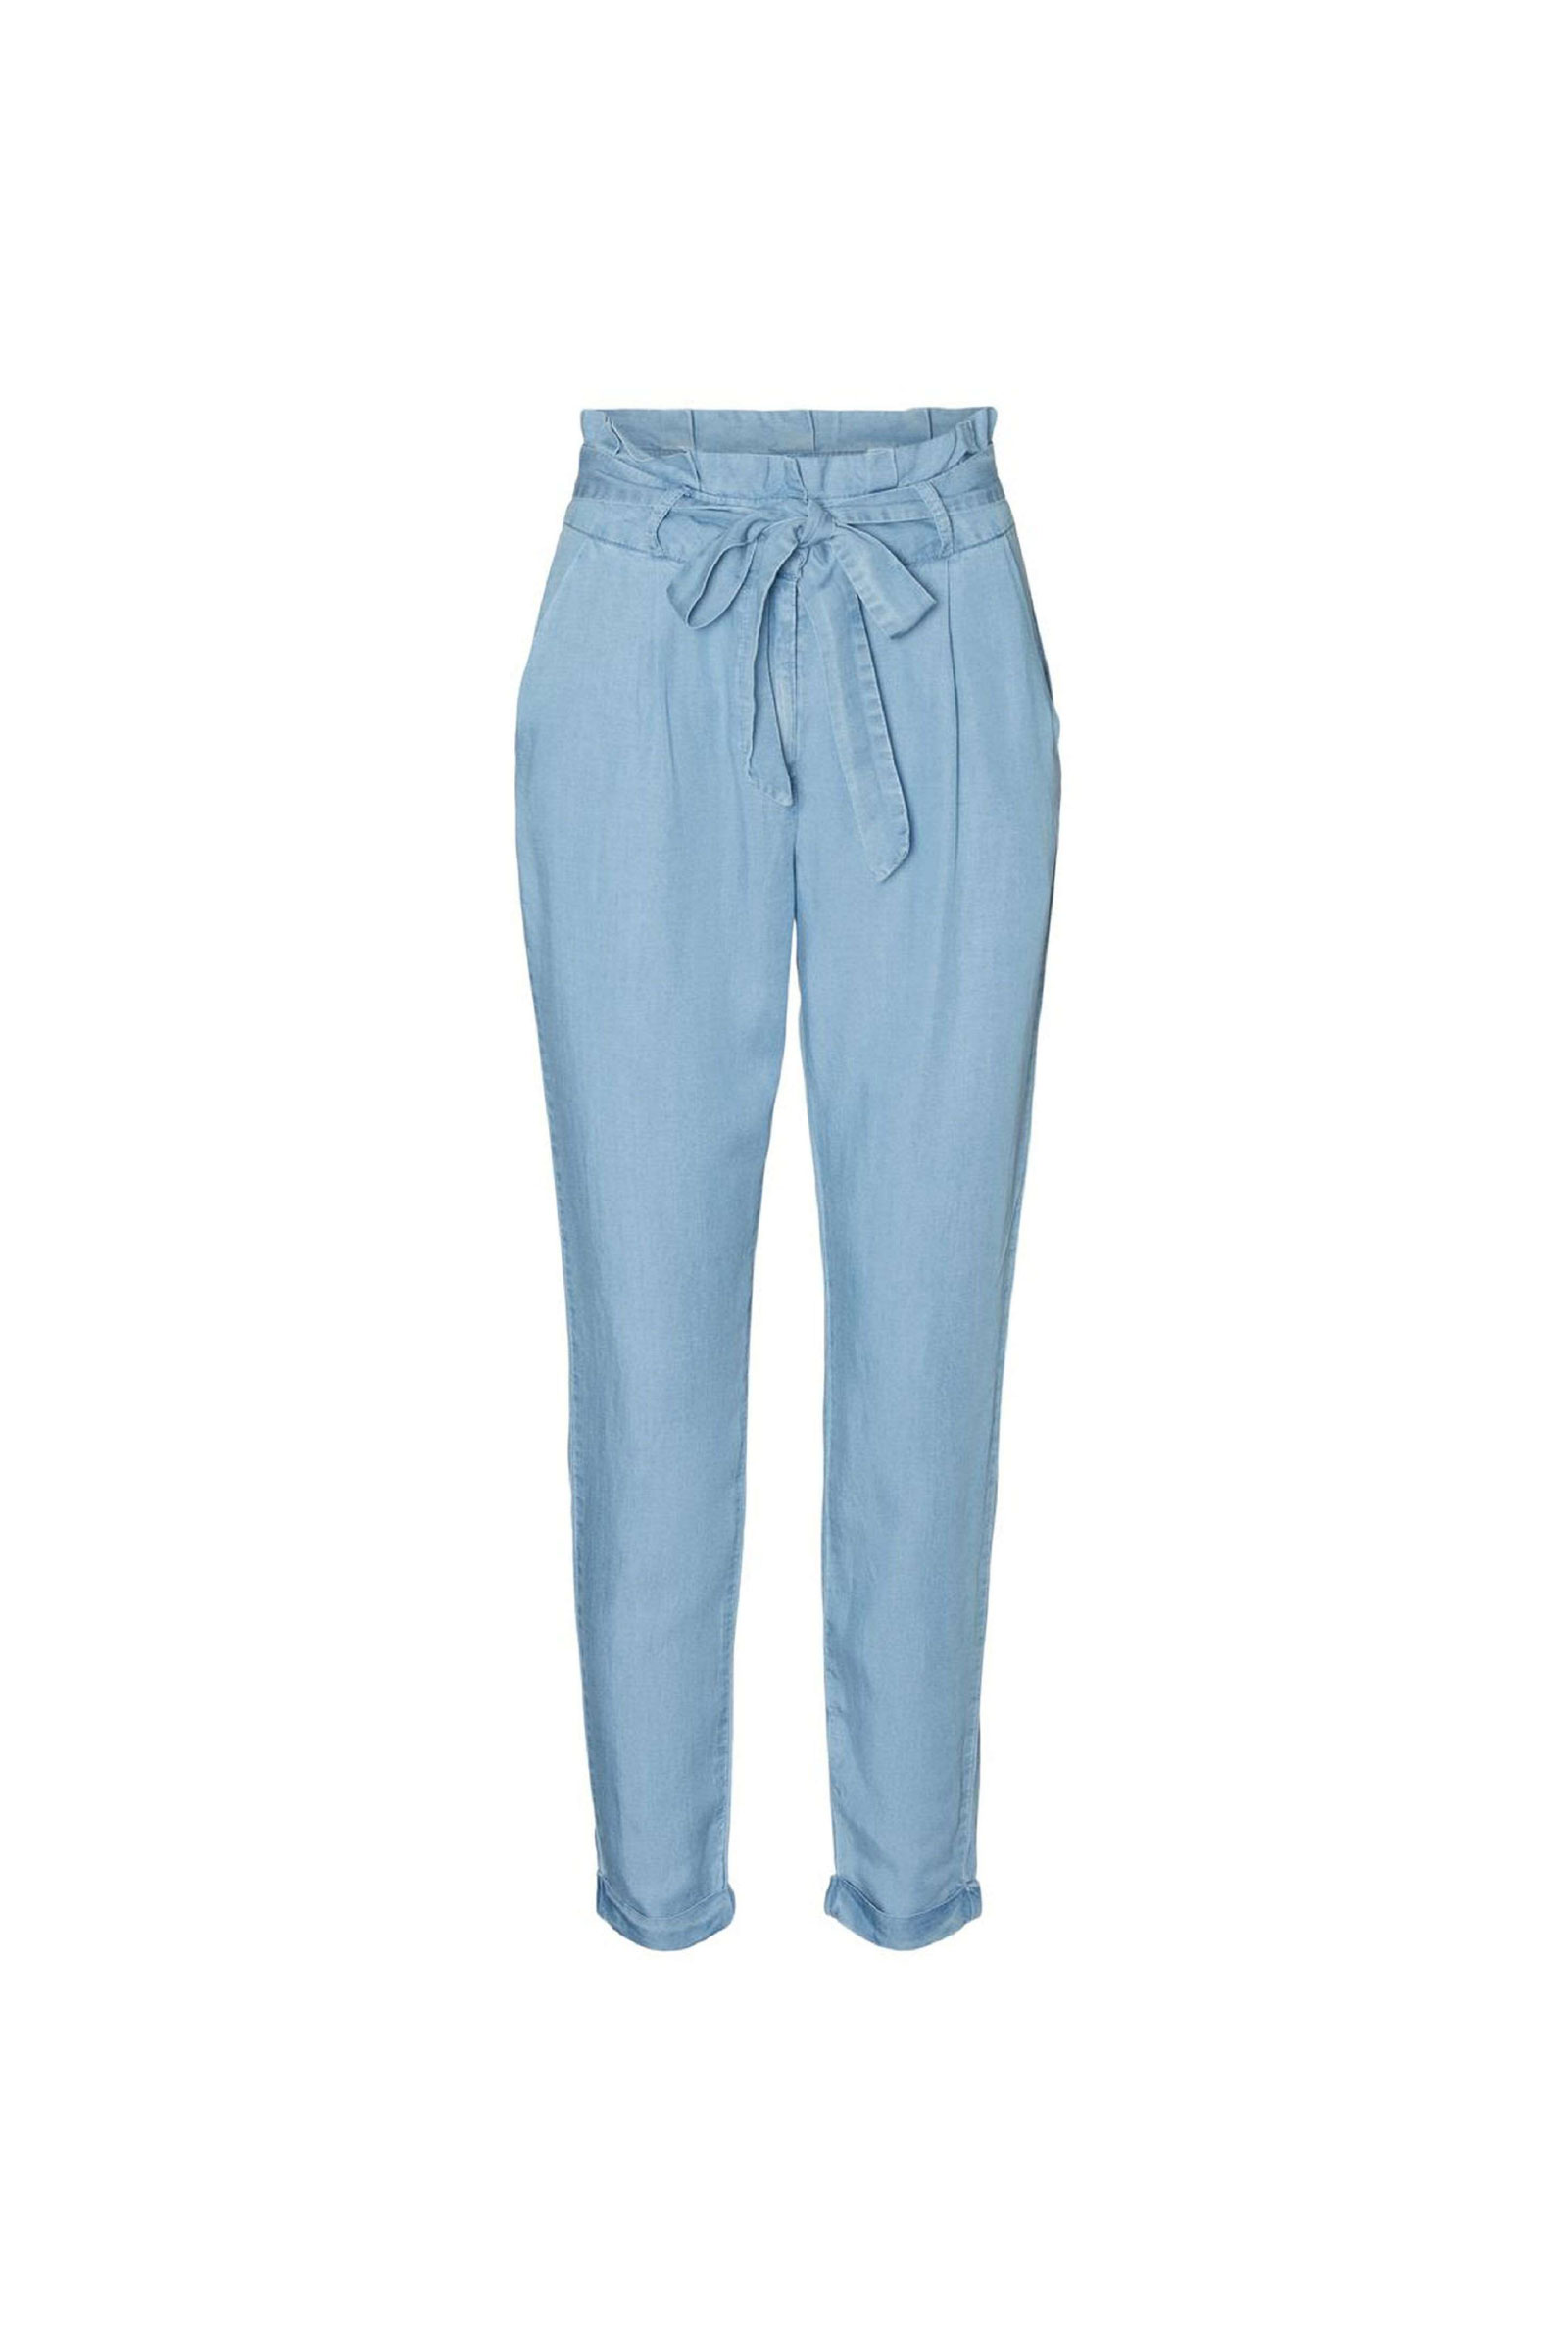 VERO MODA Women's Trousers VERO MODA | Trousers | 10242257Light Blue Denim